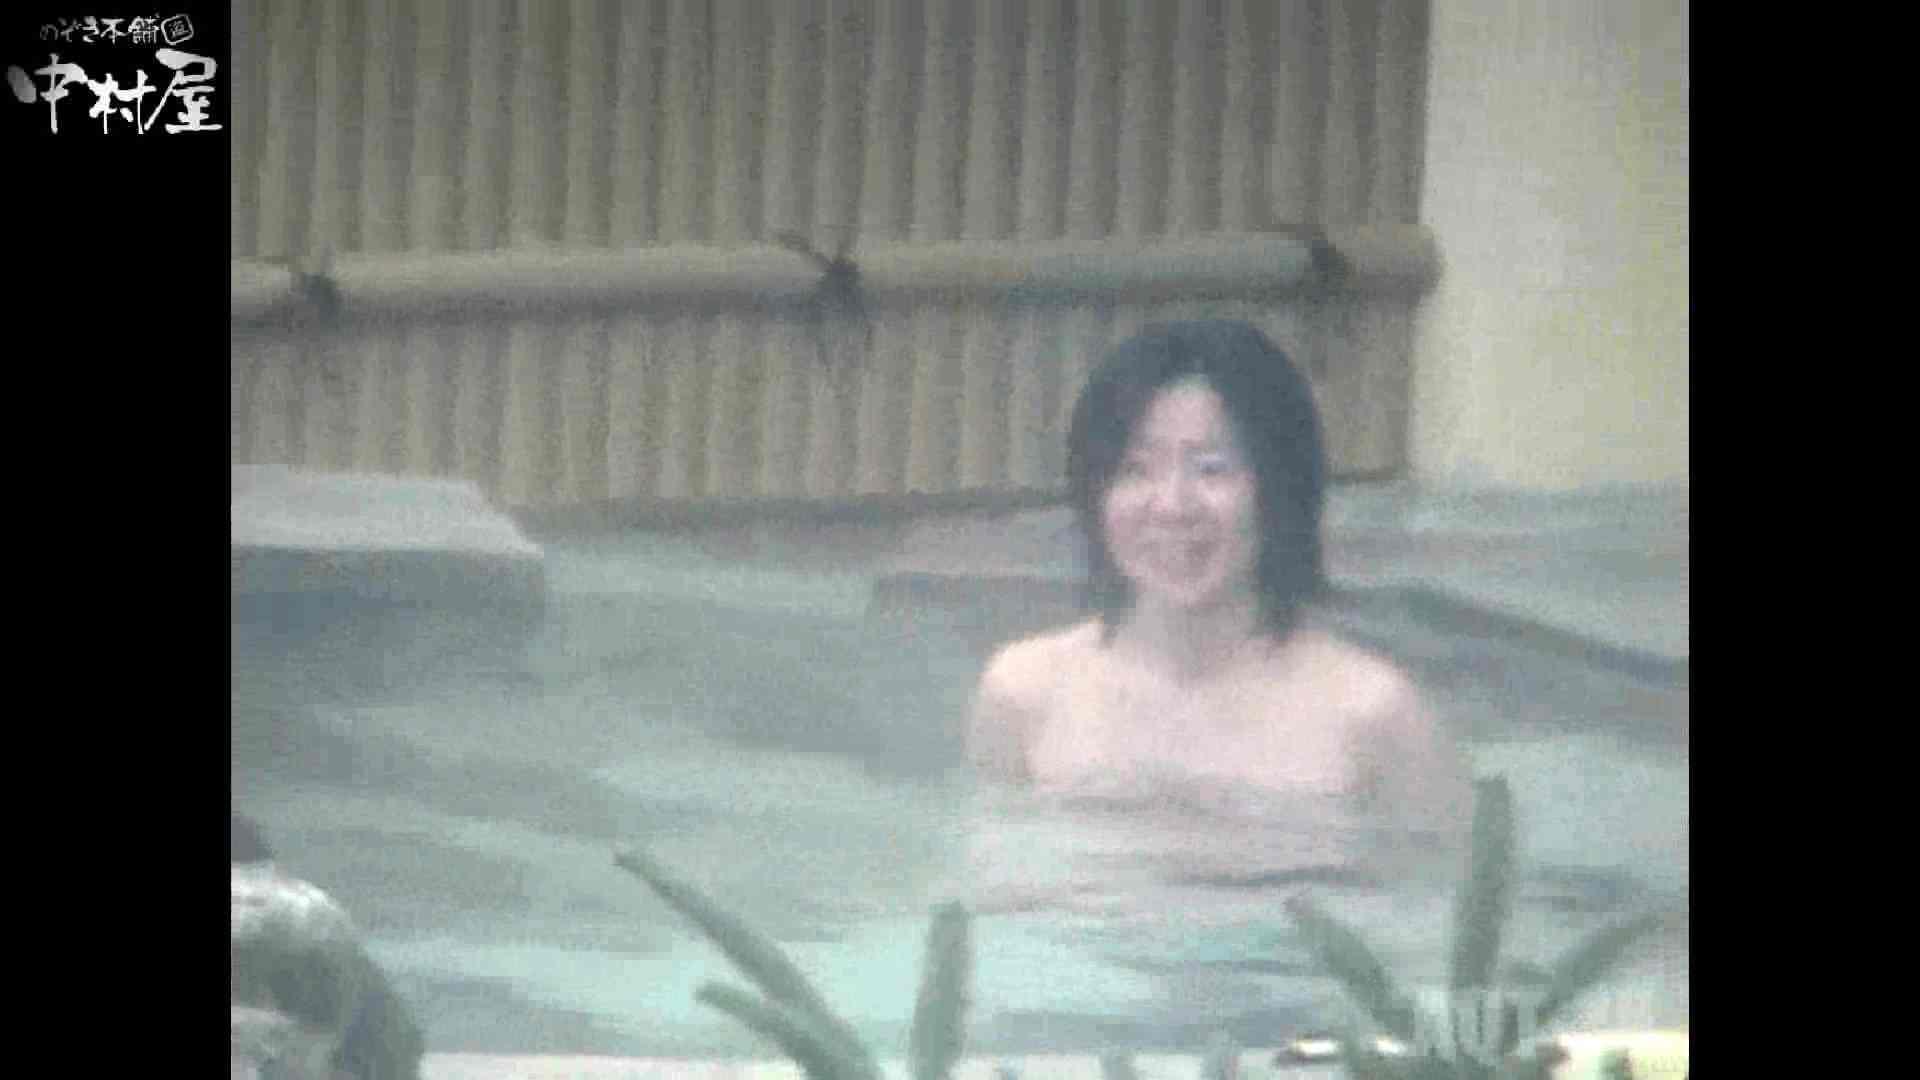 Aquaな露天風呂Vol.880潜入盗撮露天風呂十六判湯 其の三 盗撮師作品 | 美しいOLの裸体  100pic 37